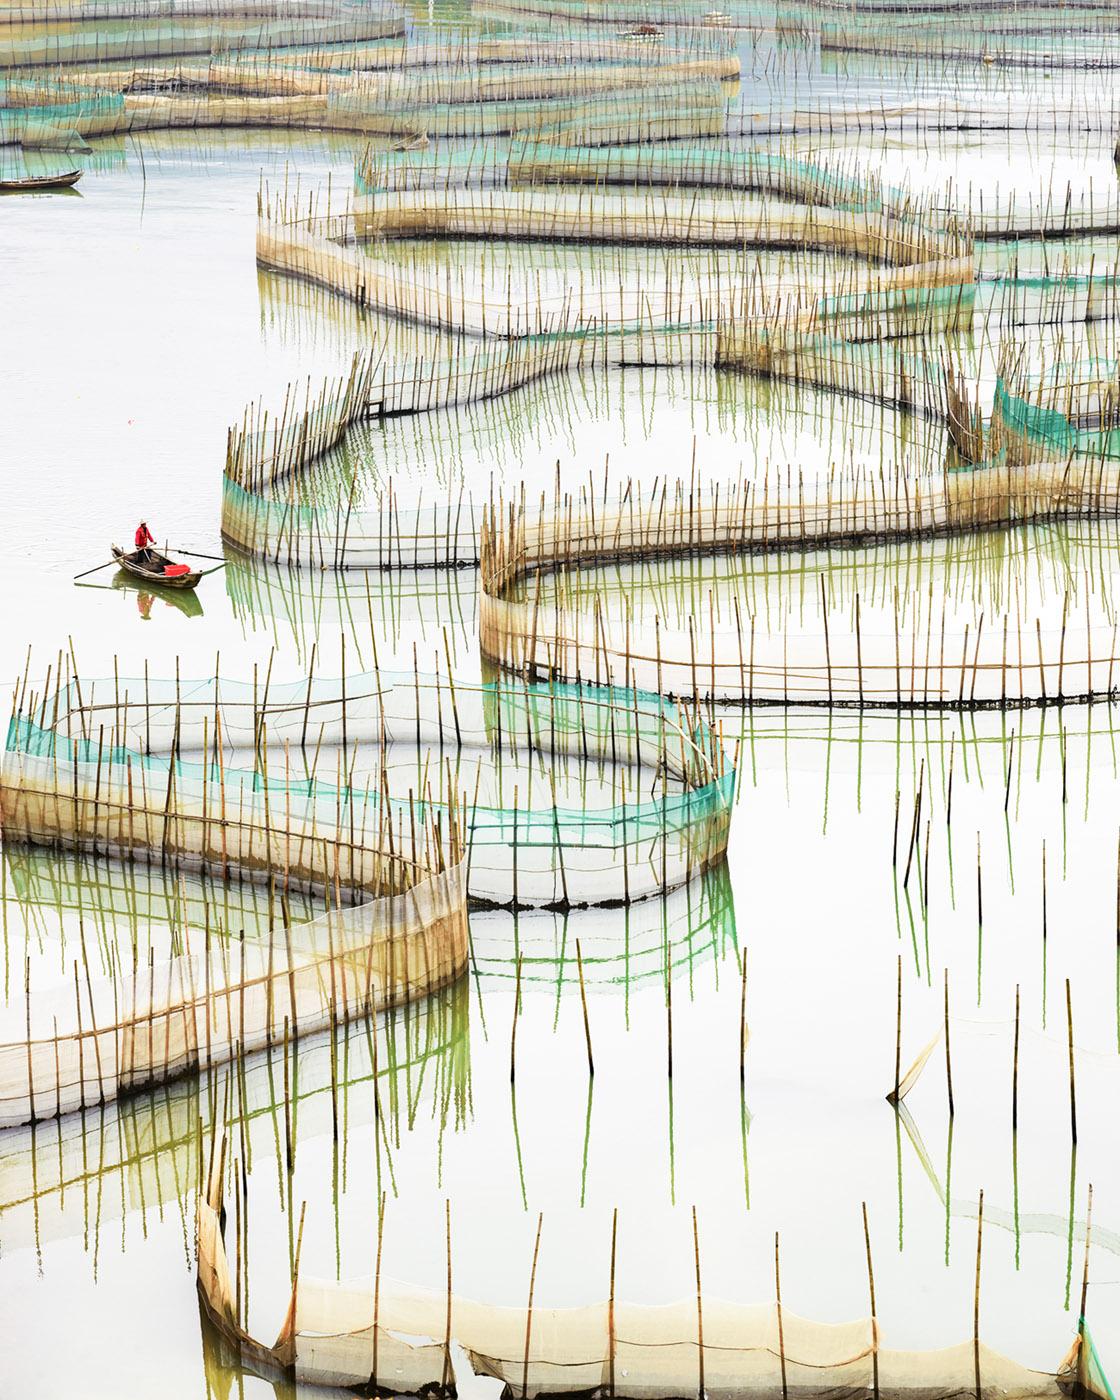 Nets (vertical), Ningde, Fujian, People's Republic of China, 2017